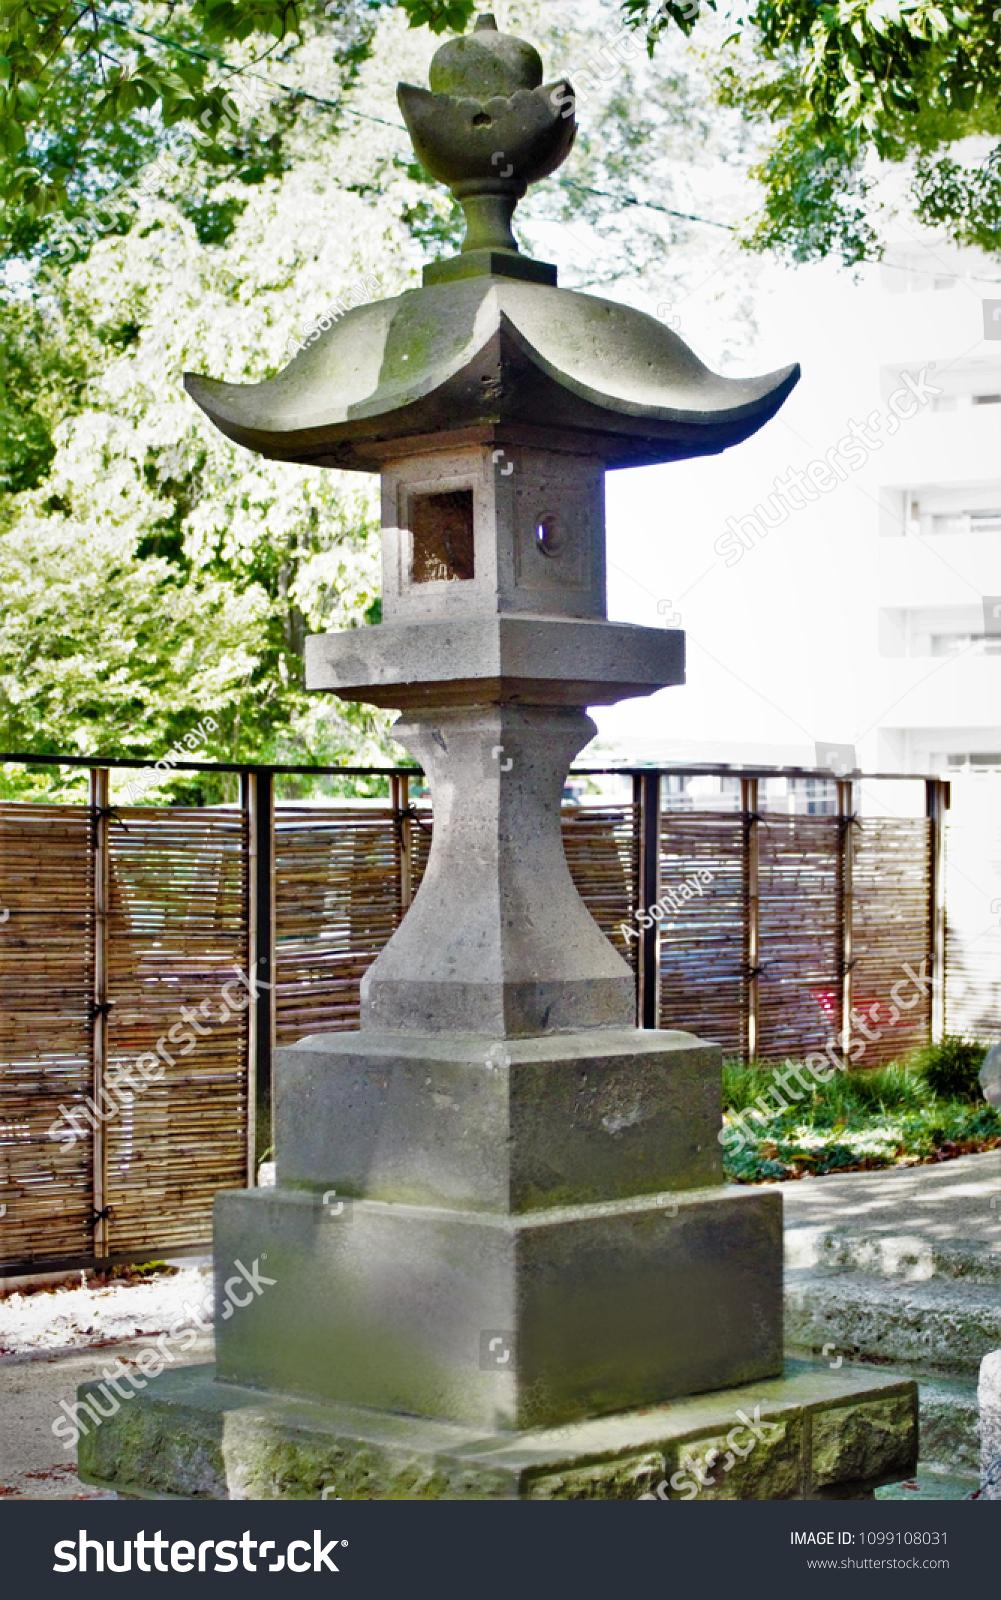 Pagoda Lantern Concrete Japan Stock Photo (Edit Now) 1099108031